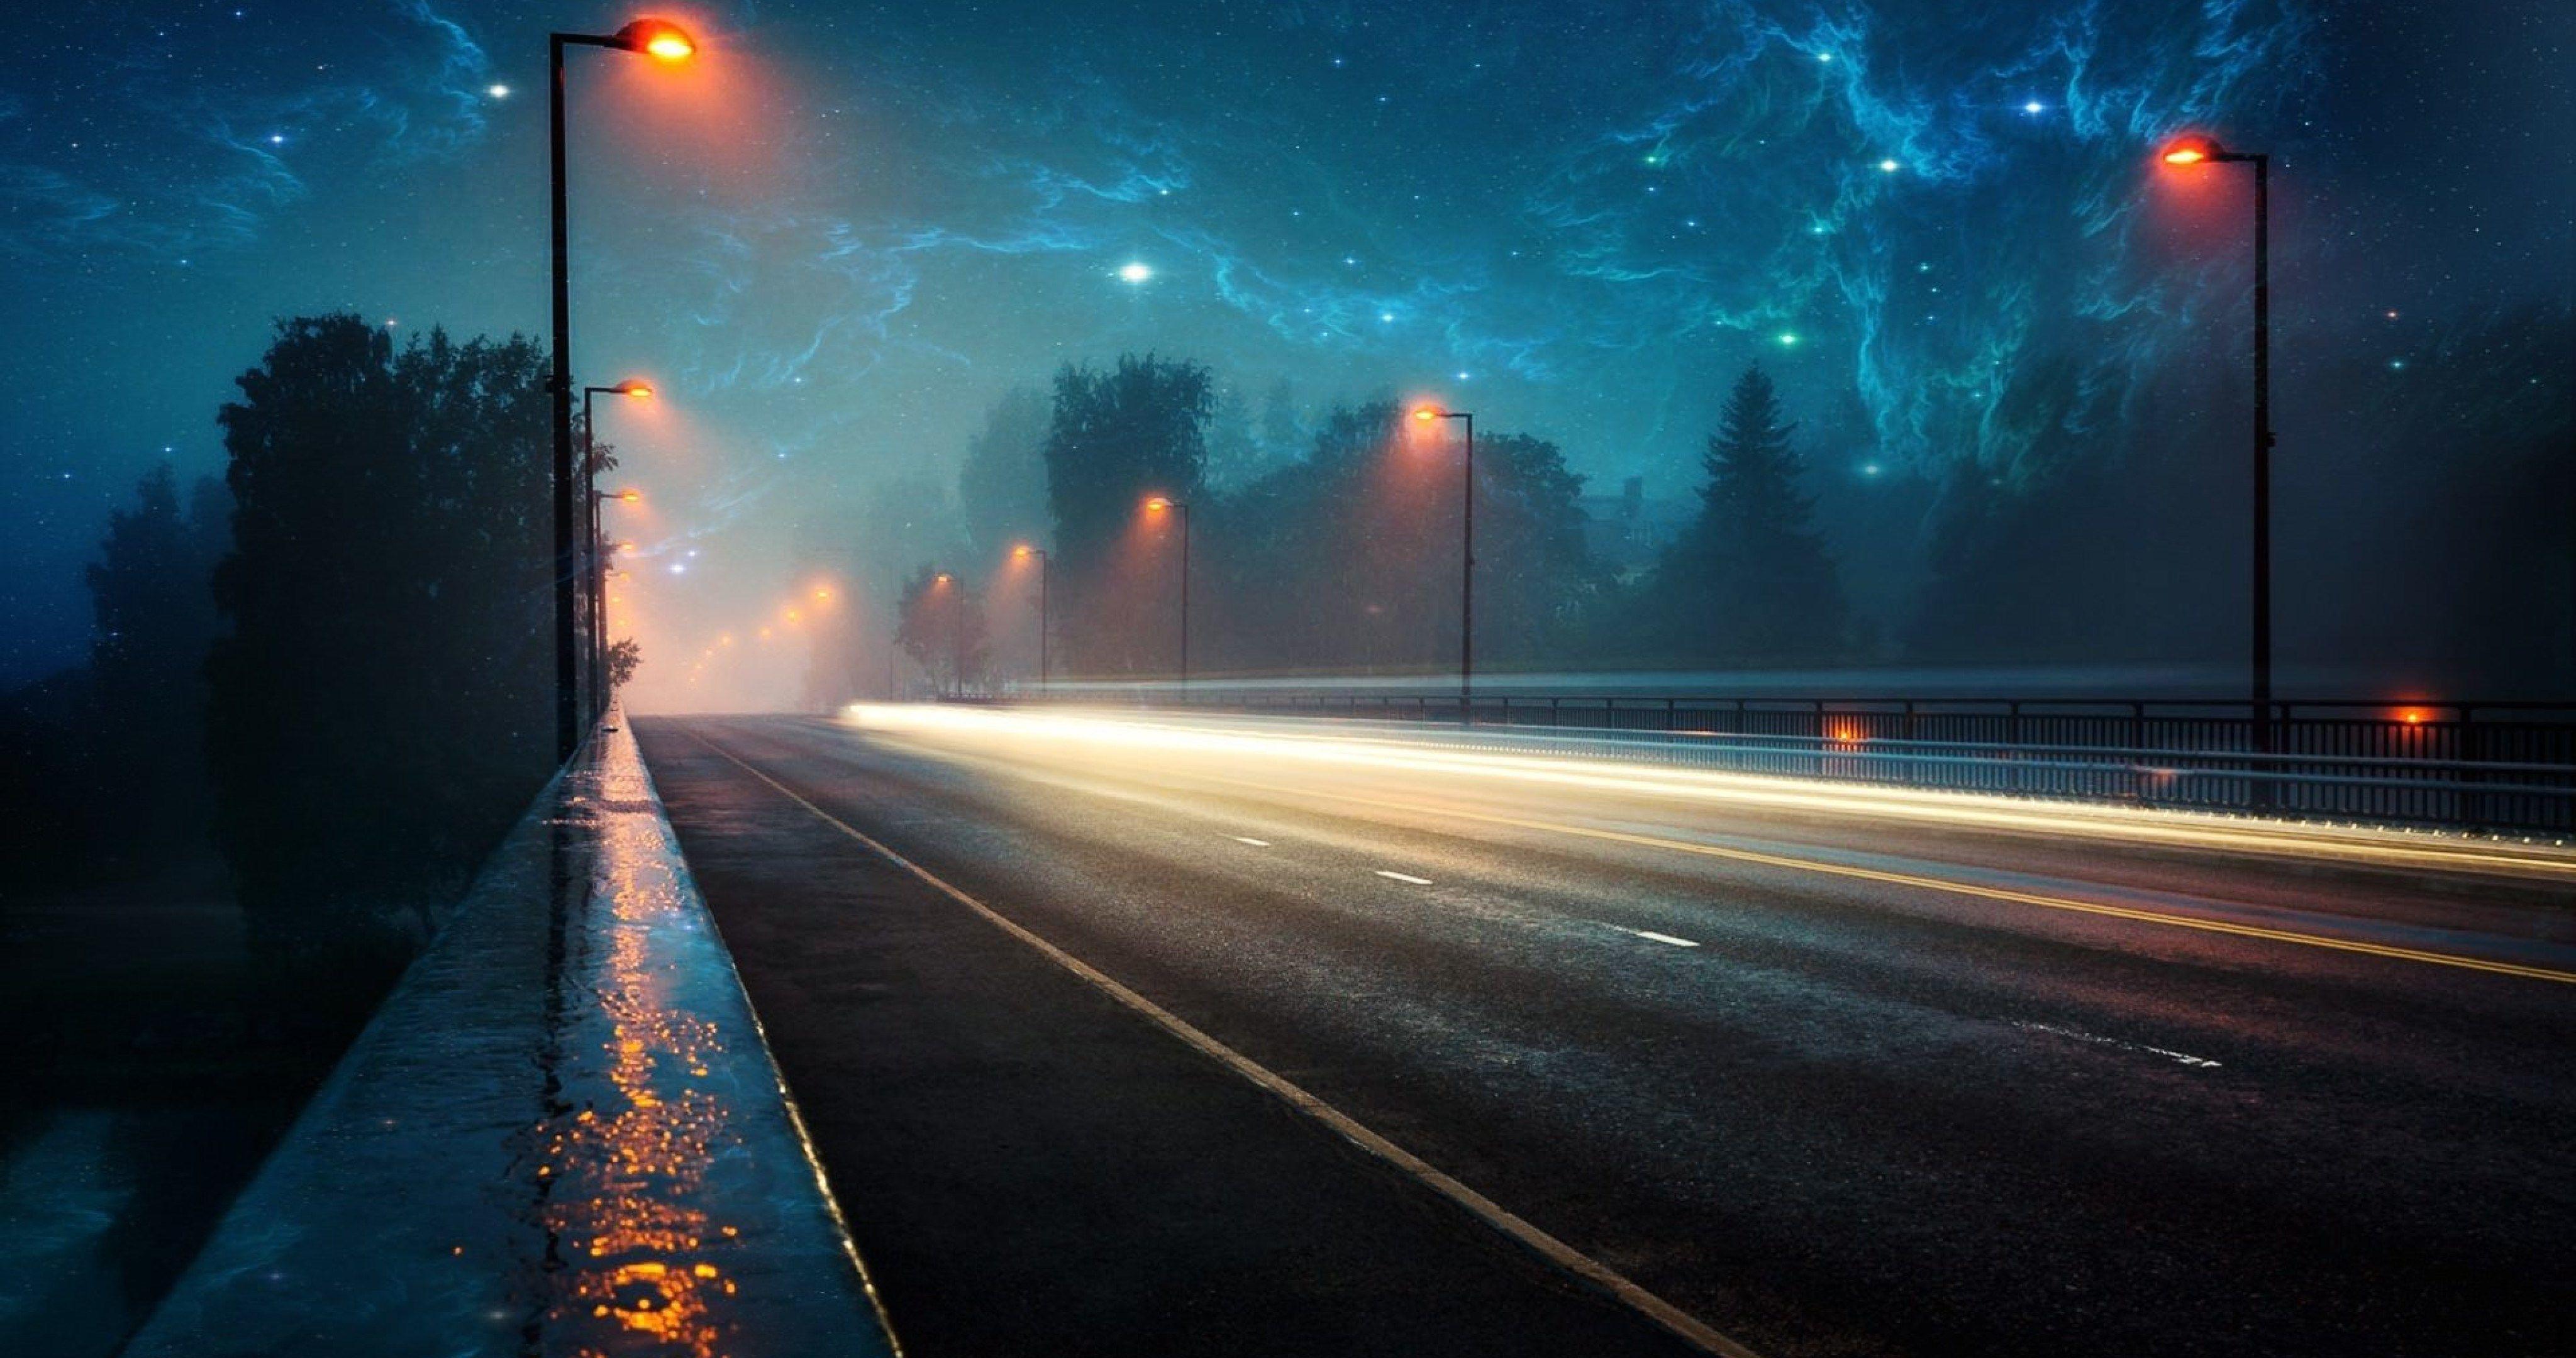 Night Aesthetic Desktop Wallpapers   Top Night Aesthetic 4096x2160